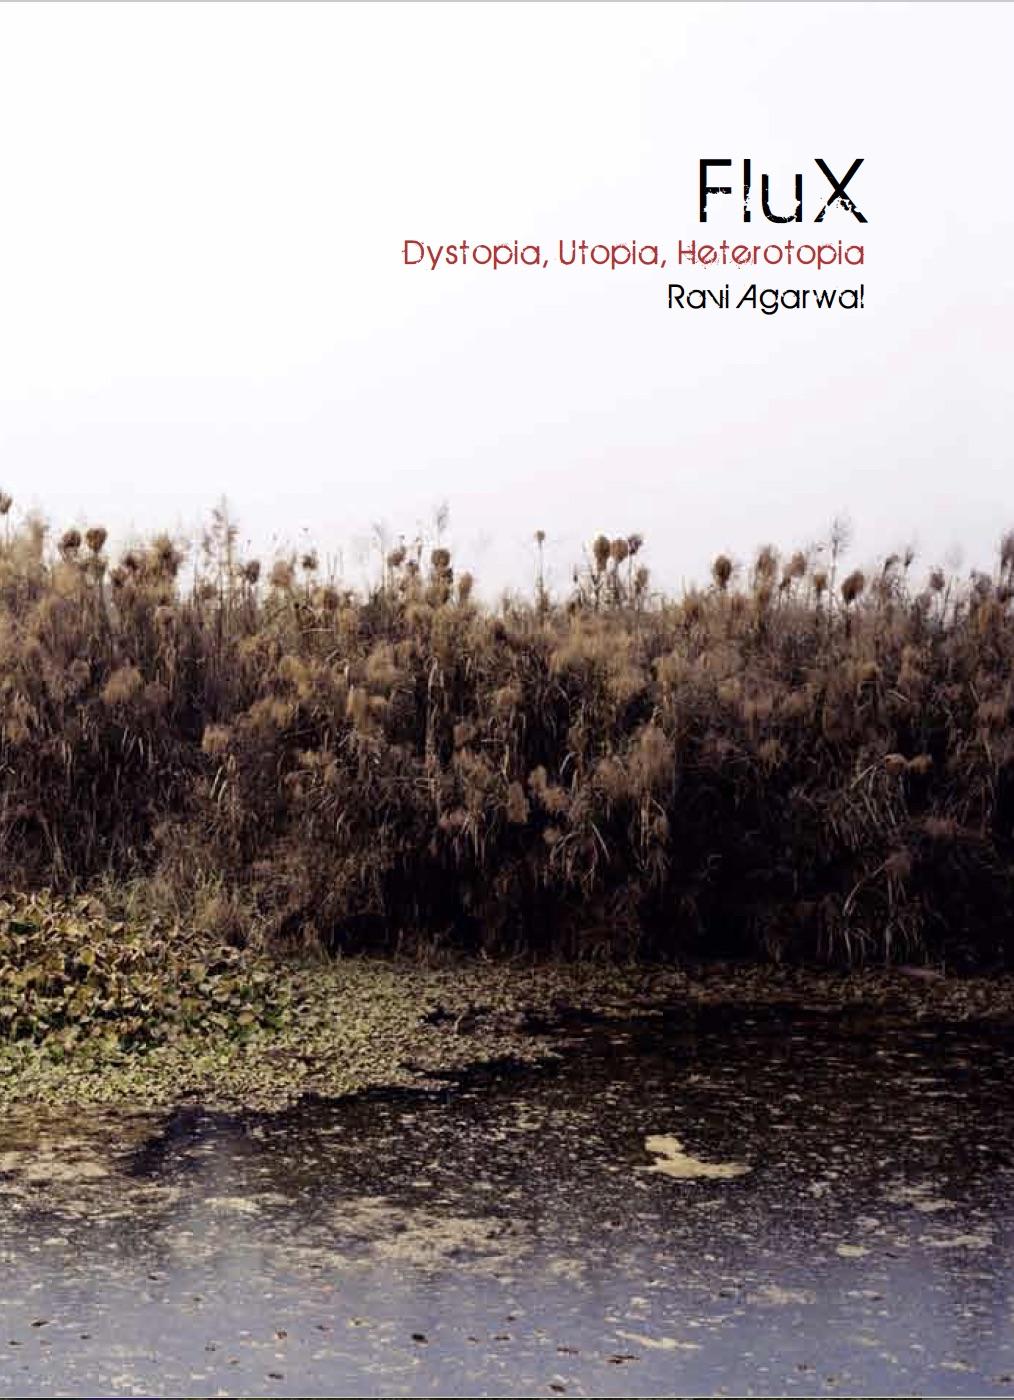 Flux Catalogue. Gallery Espace, 2011